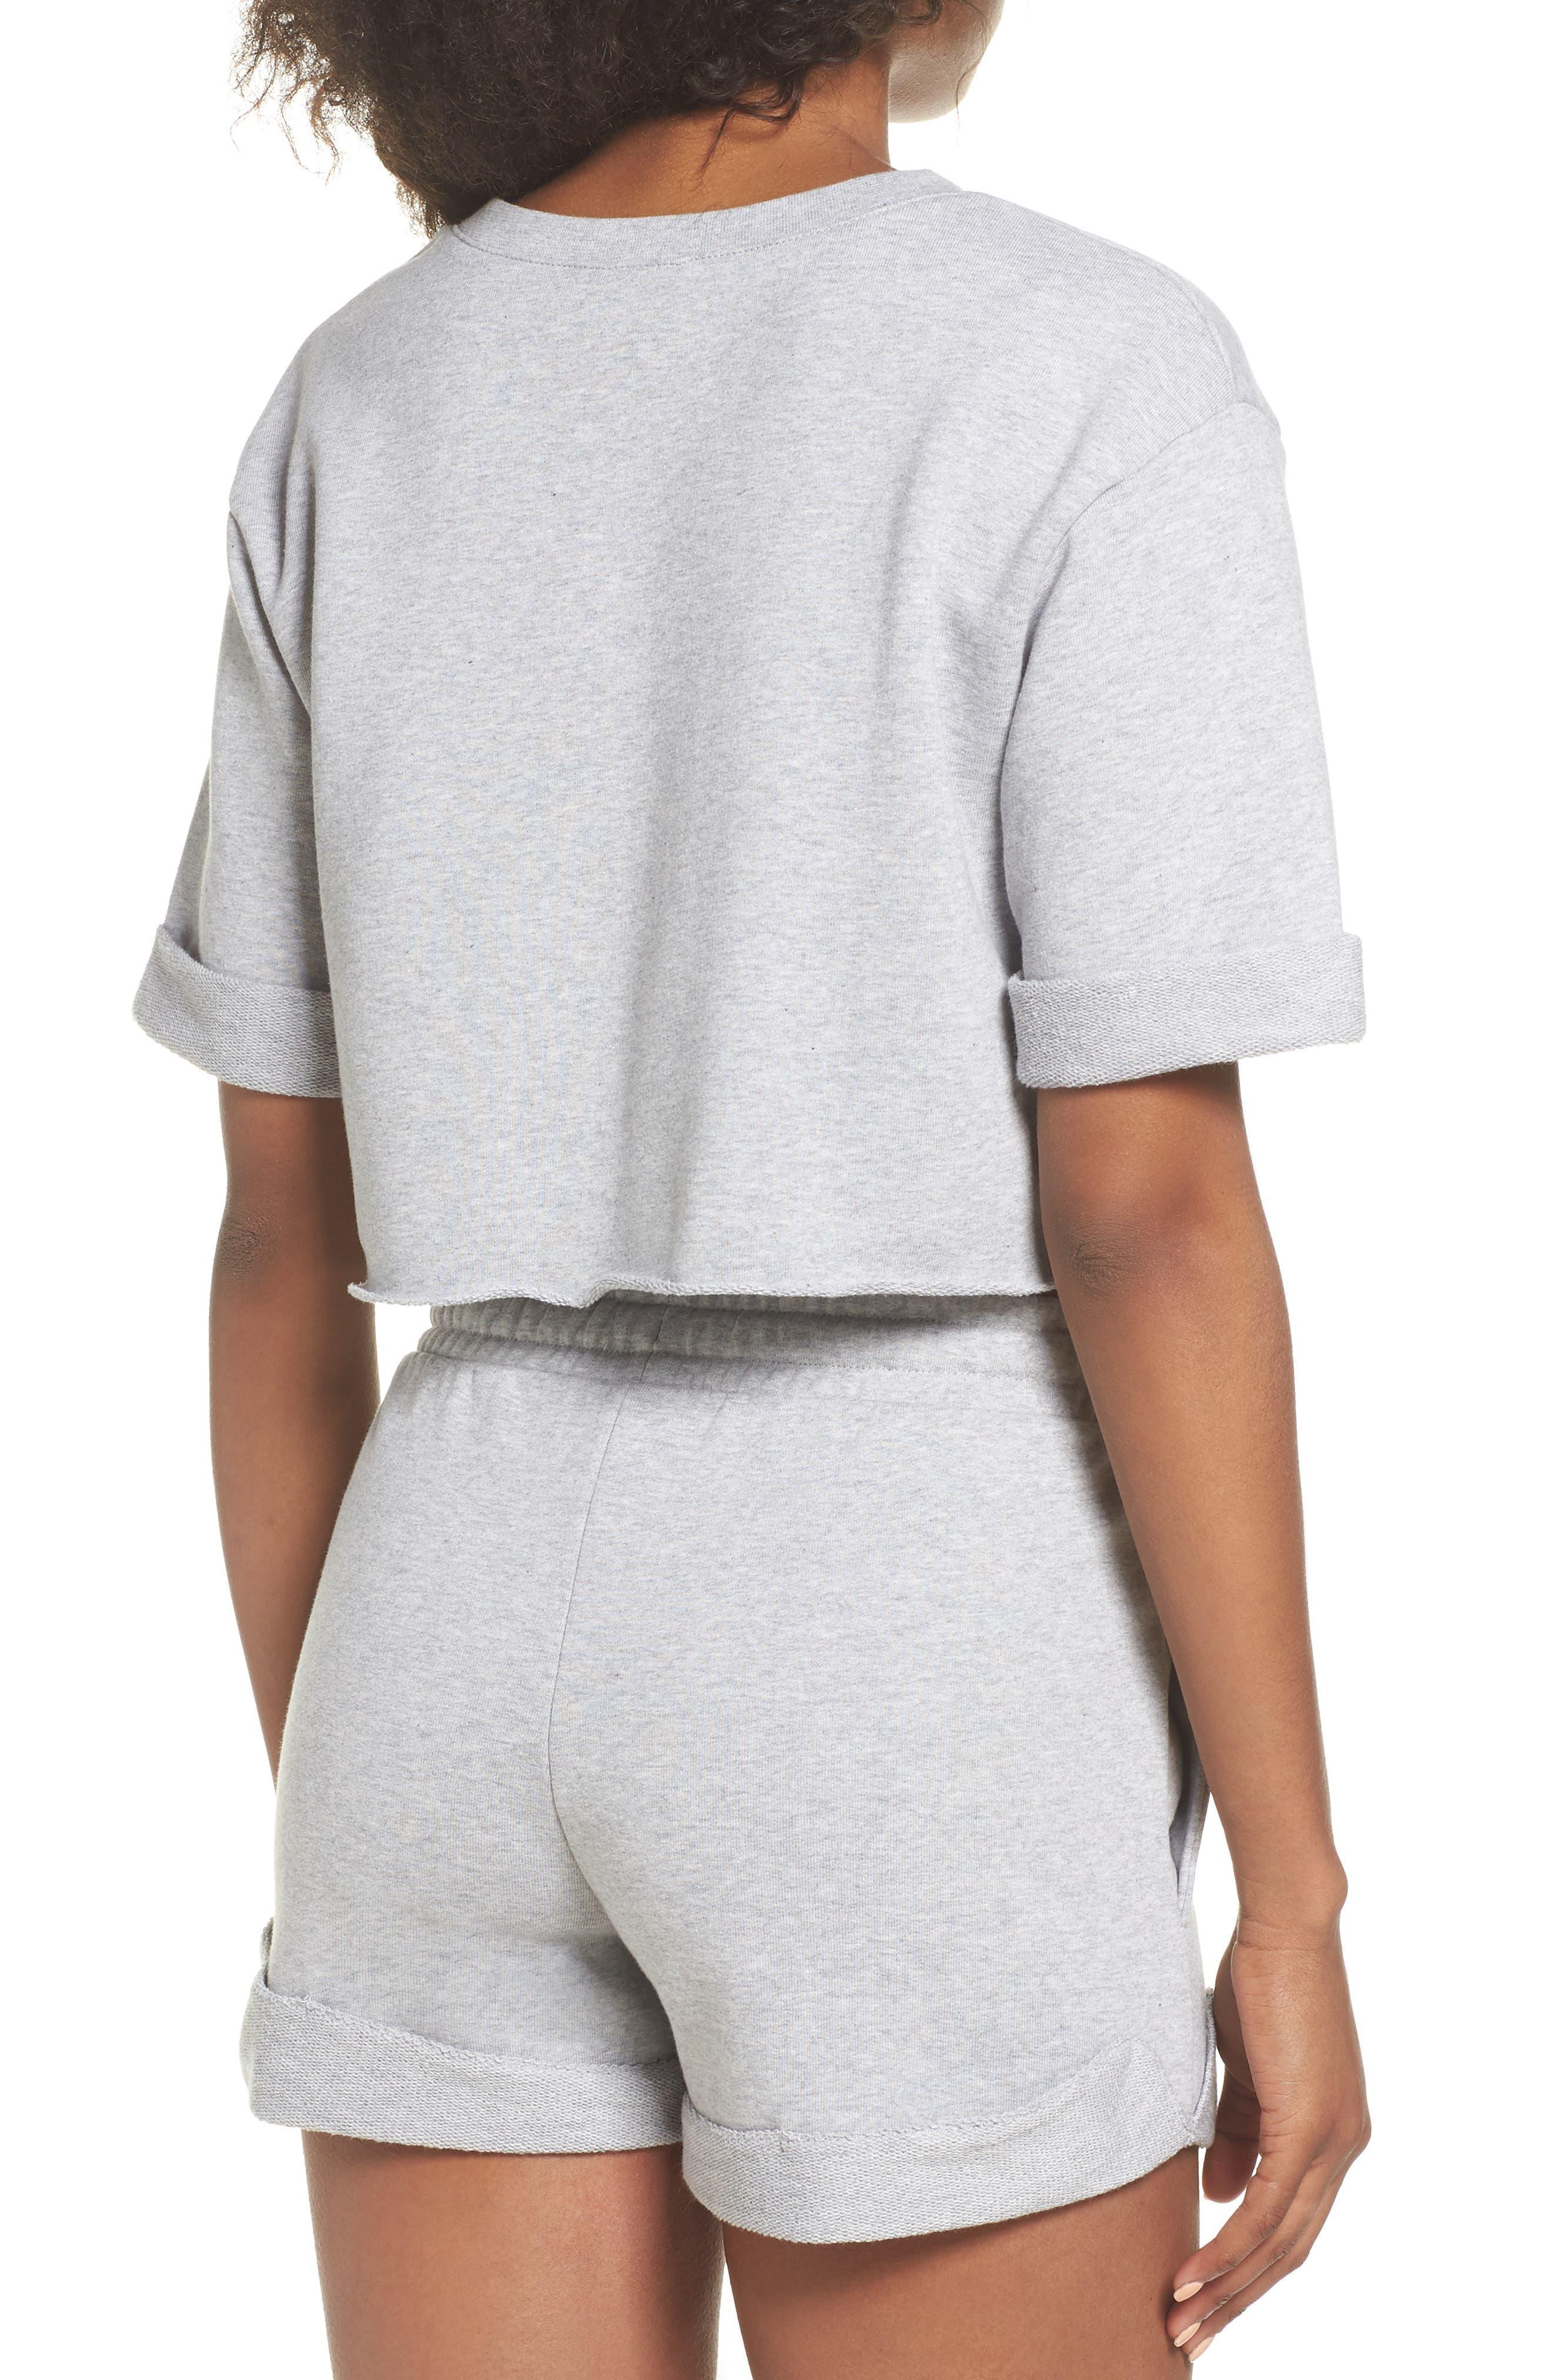 French Terry Crop Sweatshirt,                             Alternate thumbnail 2, color,                             Light Grey Marl